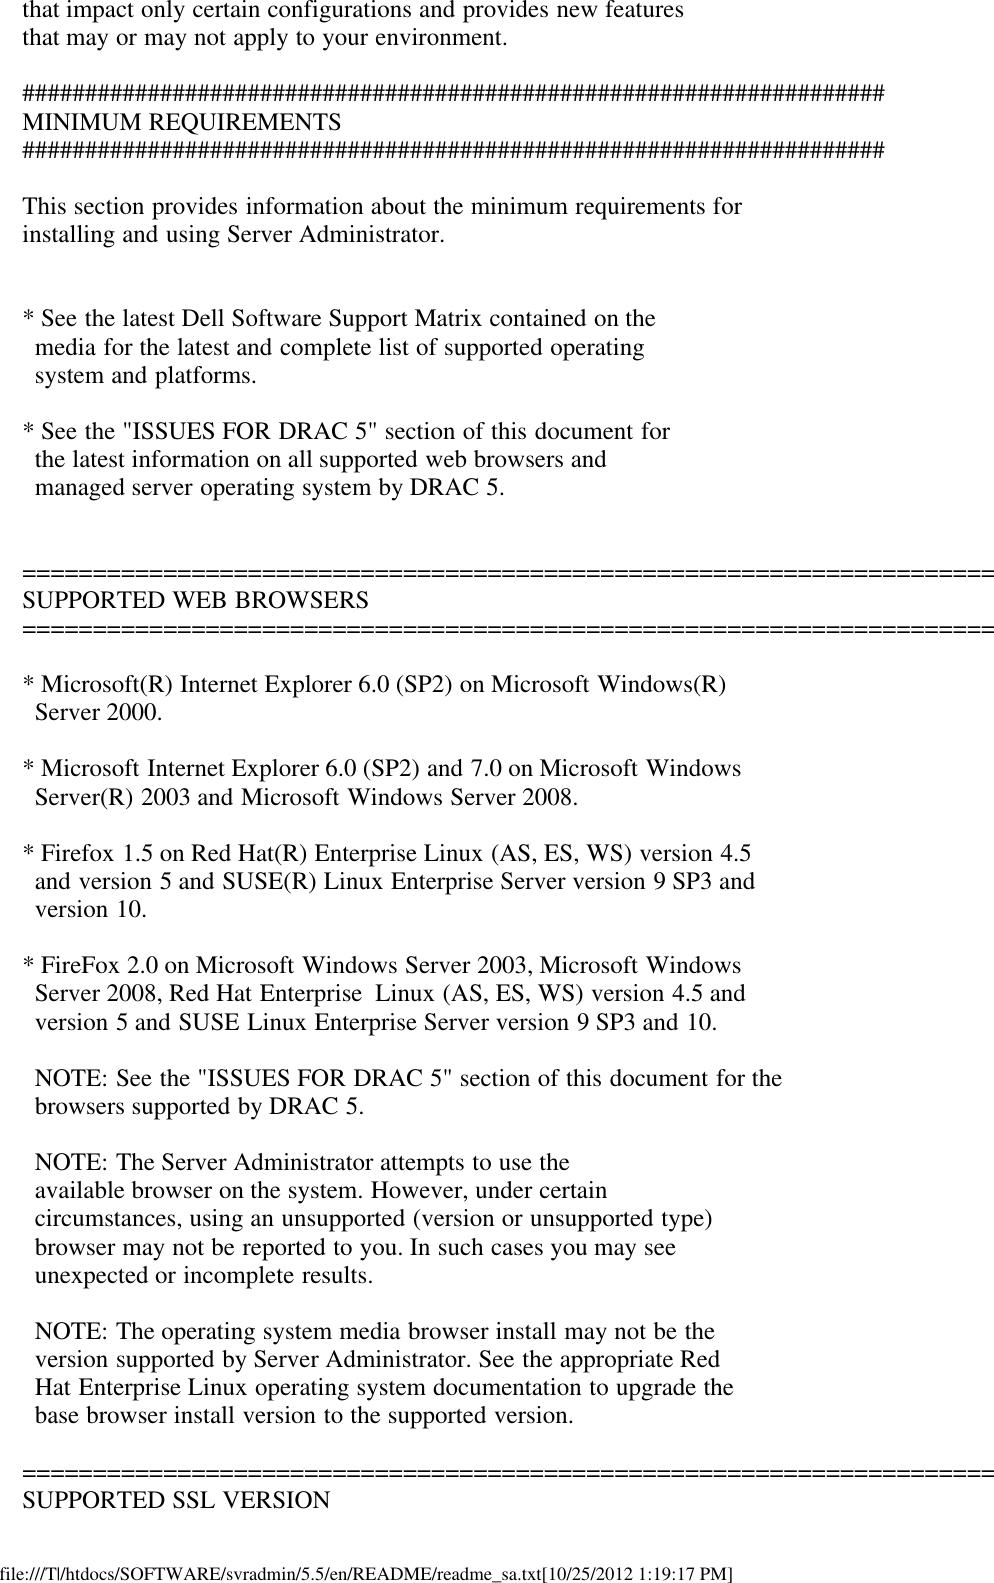 Dell Openmanage Server Administrator Version 5 Read Me 5 5